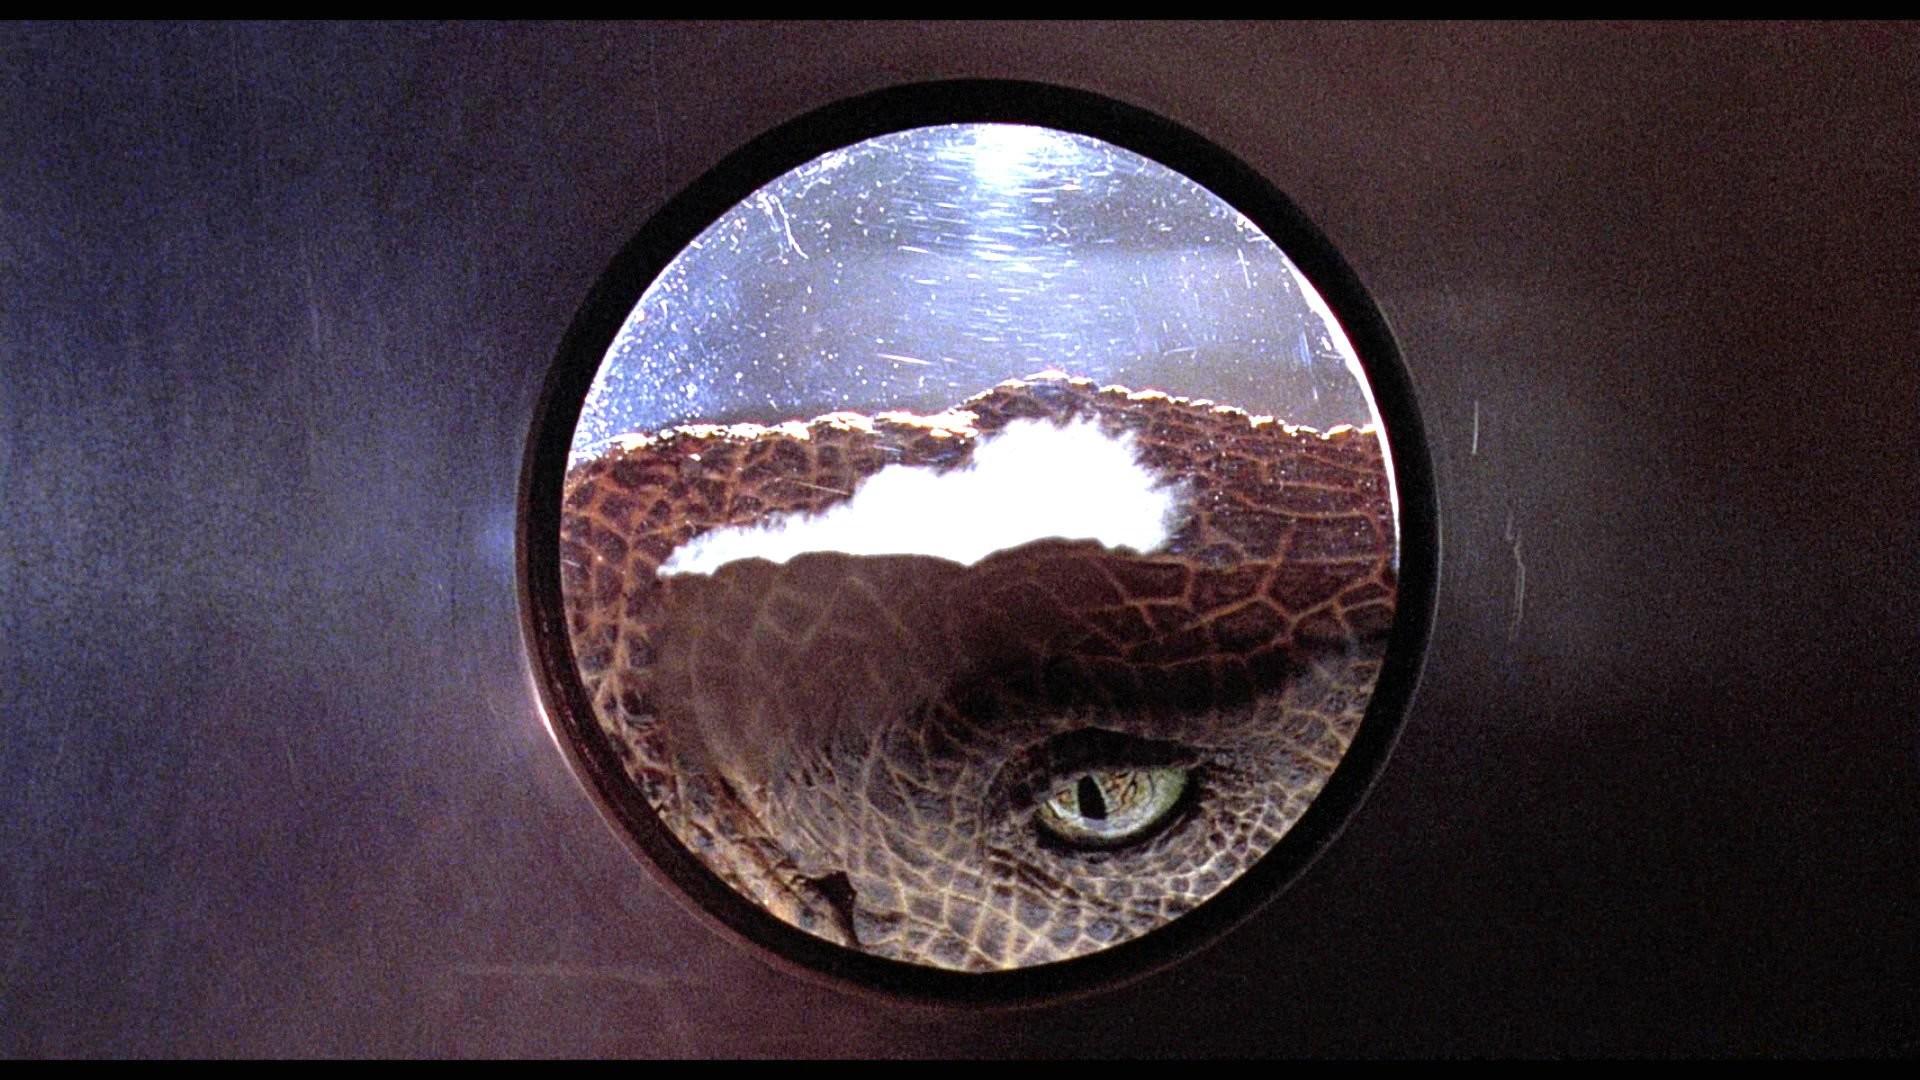 Jurassic Park Wallpaper Phone …